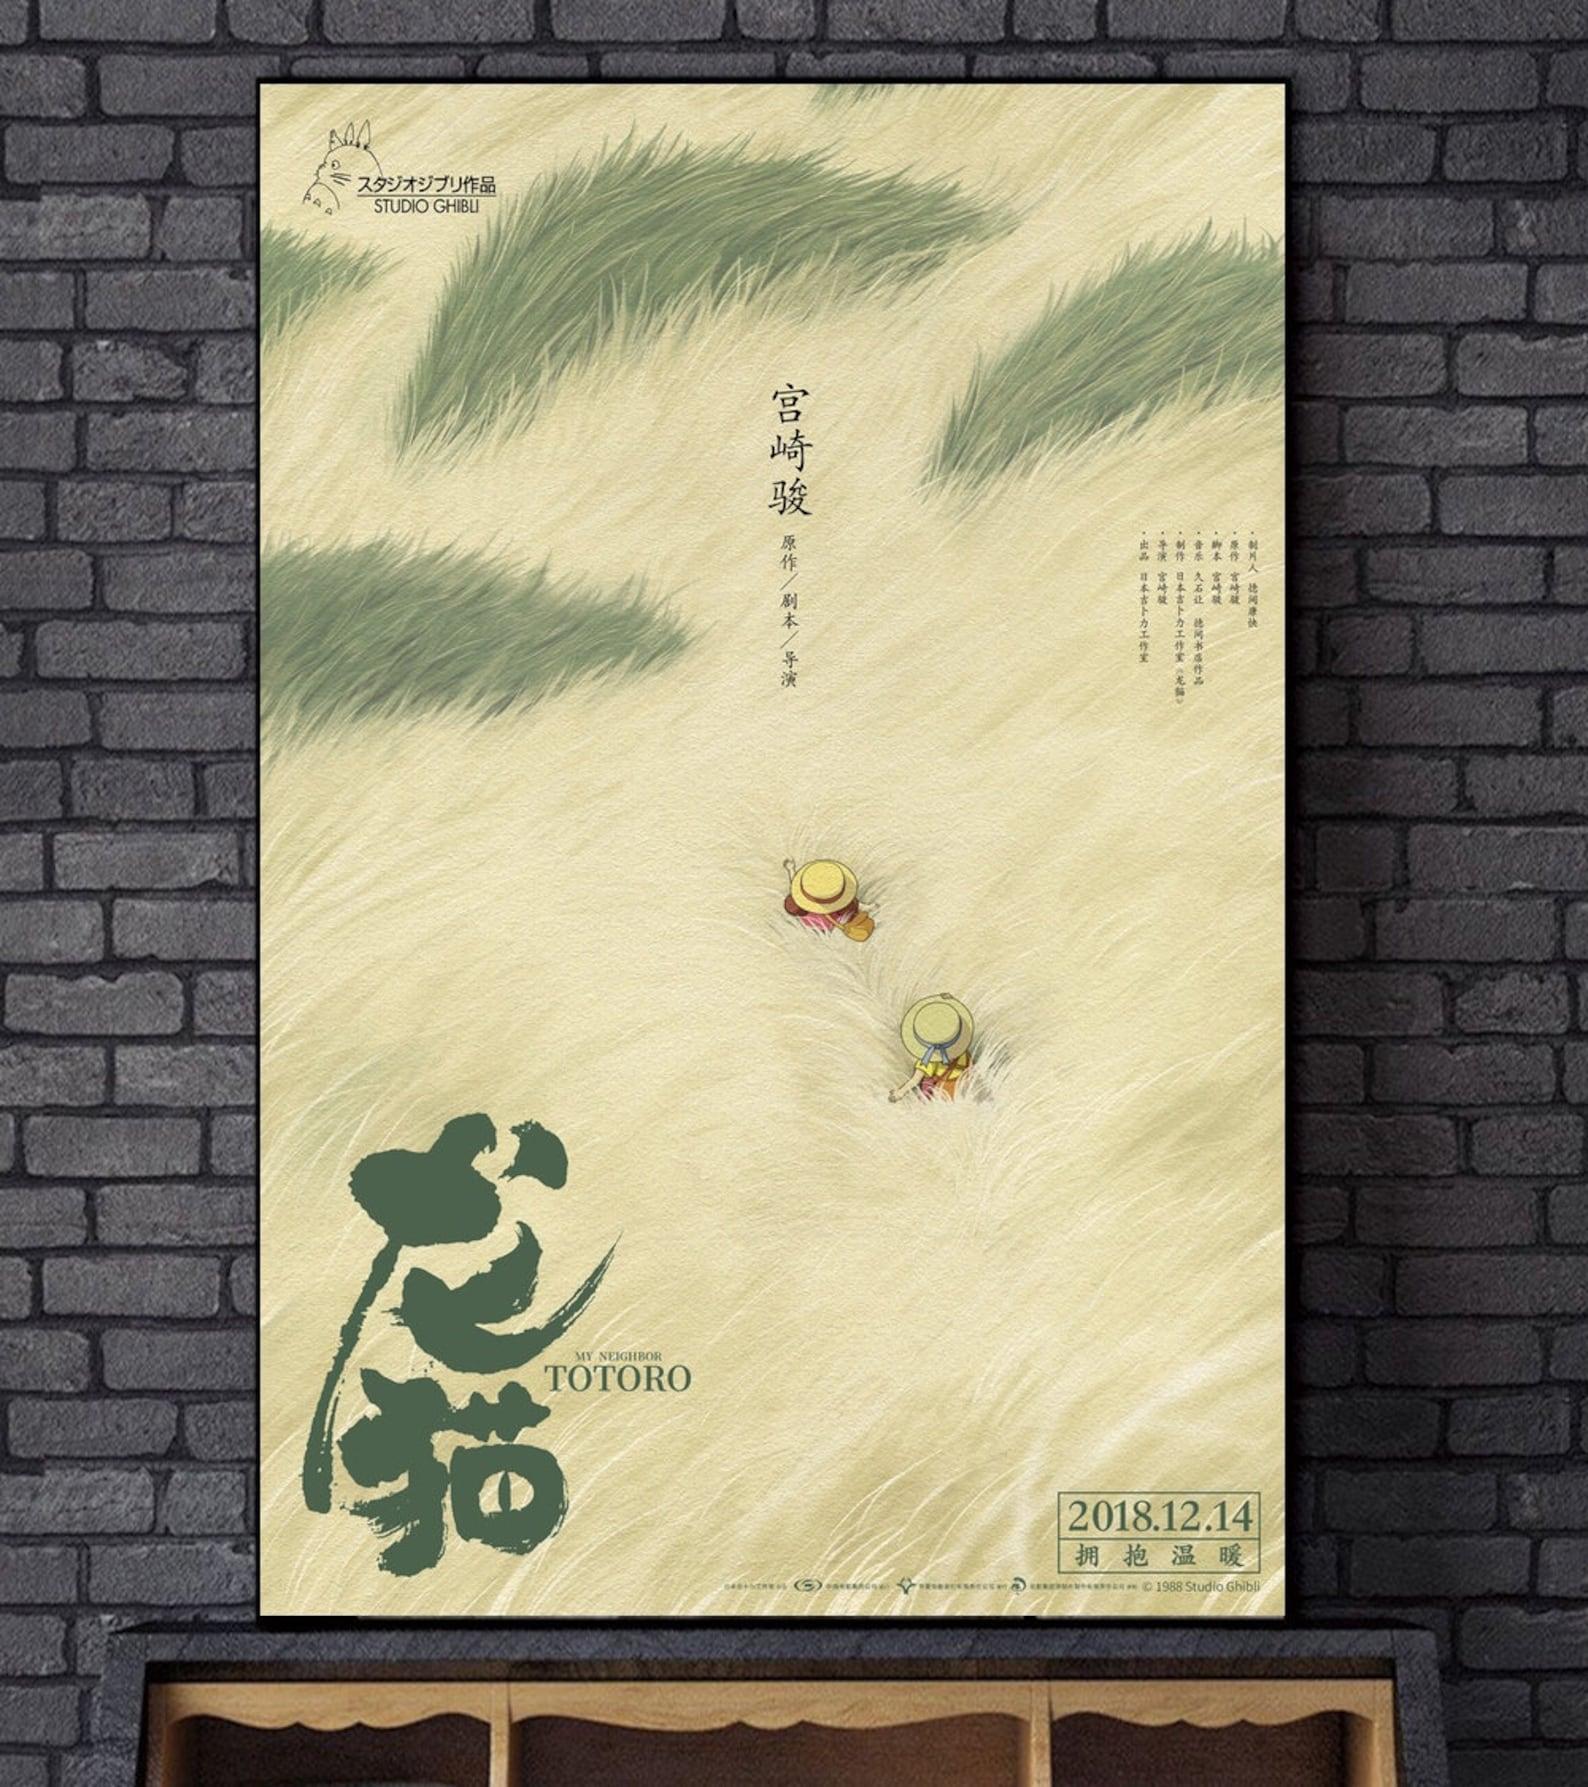 My Neighbor Totoro Japanese Anime Movie Poster Art Canvas Print (No Frame)